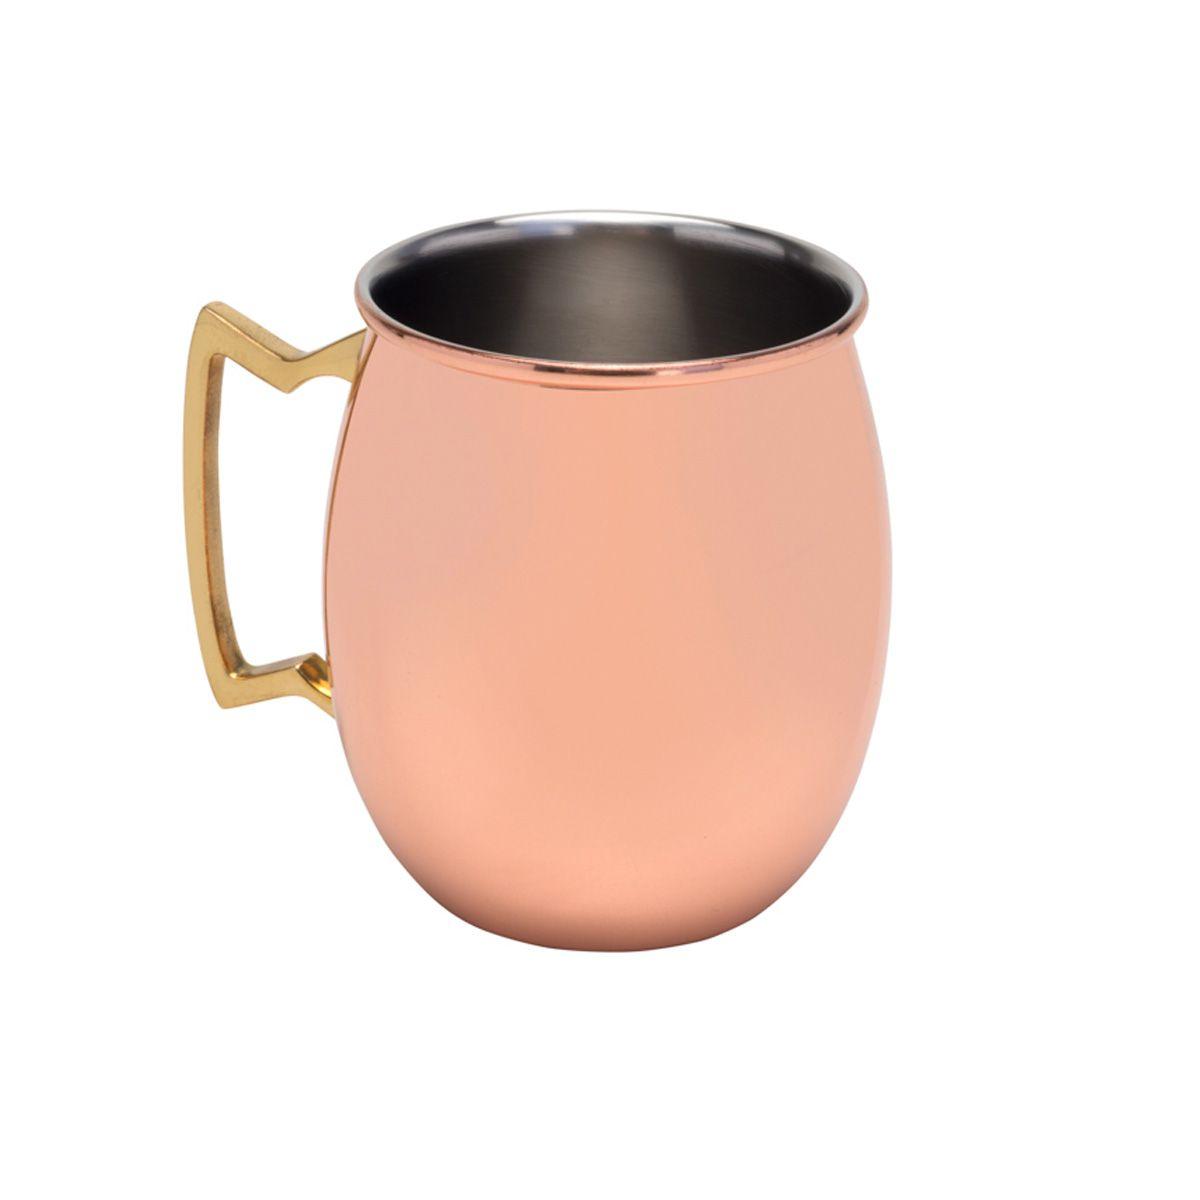 Caneca 550ml para Moscow Mule de aço inox cobre rosé gold Delhi Royal - 27319